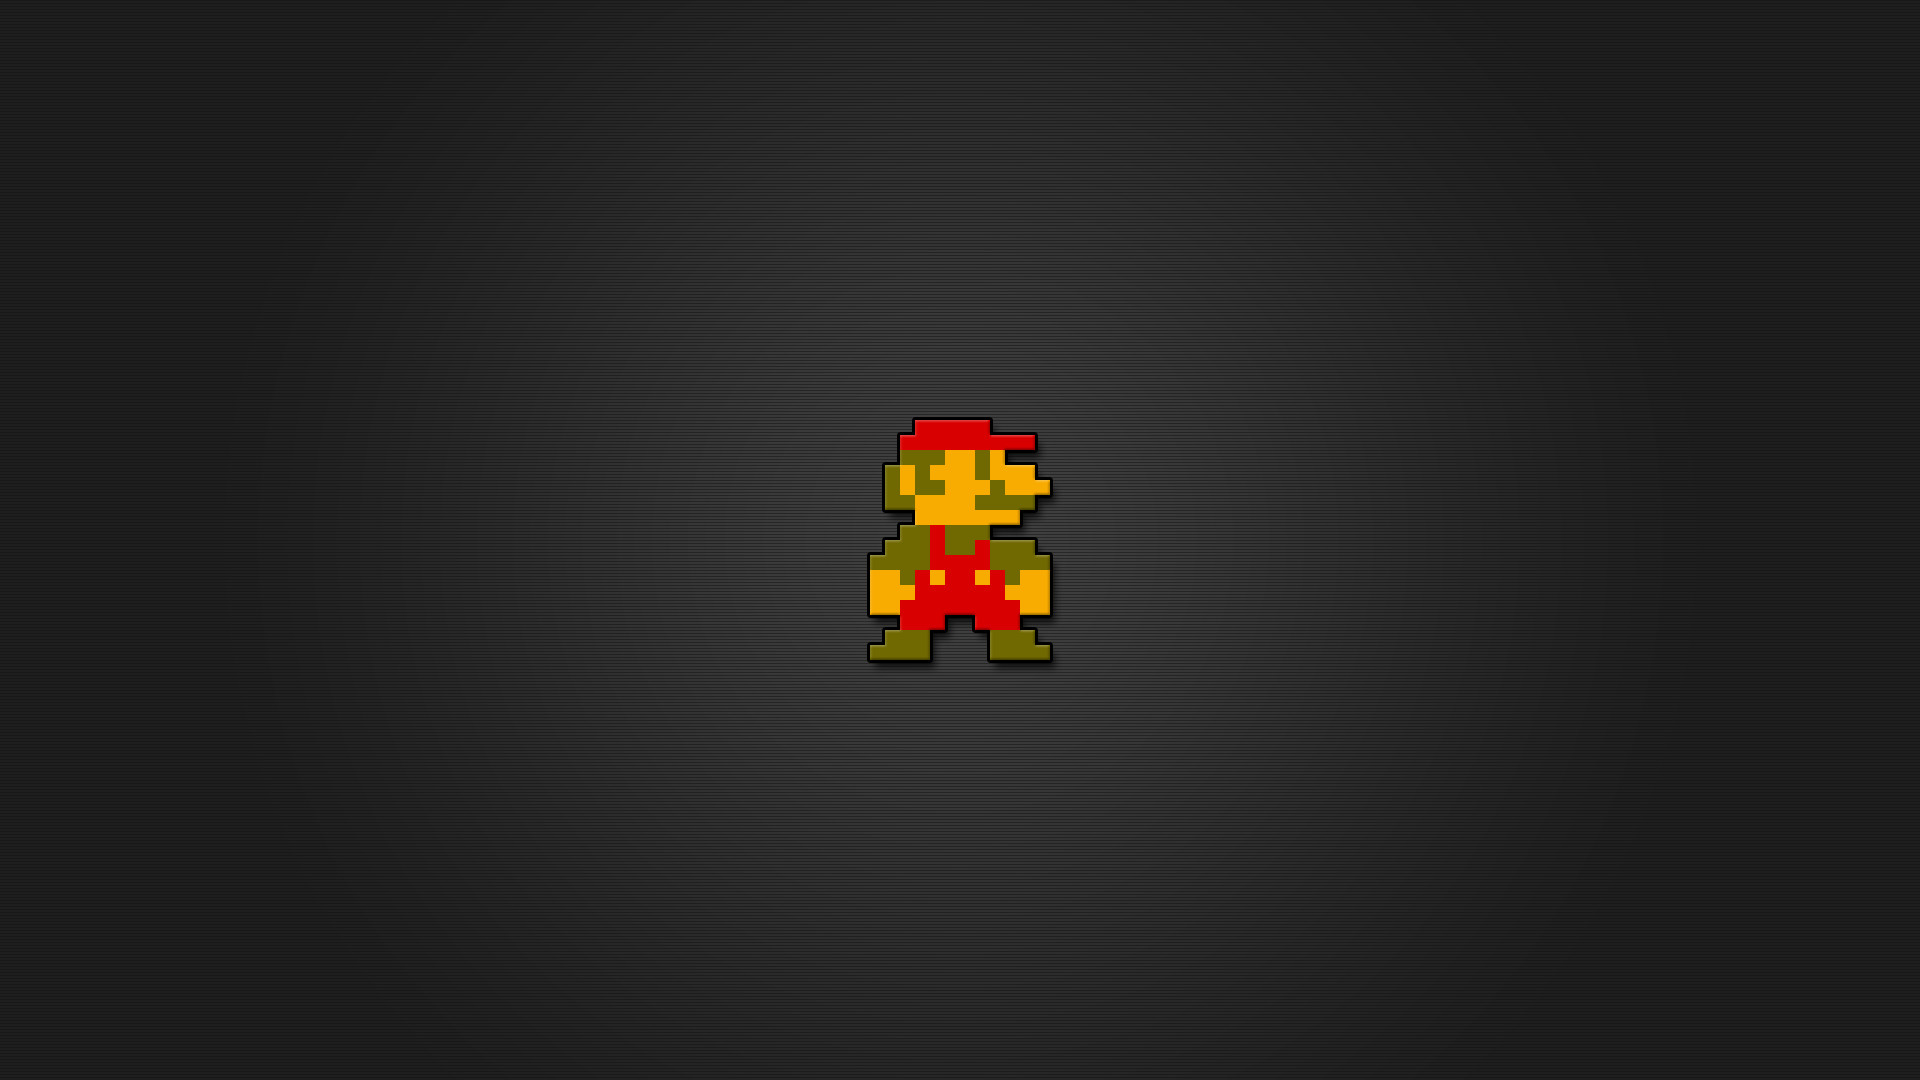 … Super Mario 8bit Wallpaper HD by LaChRiZ